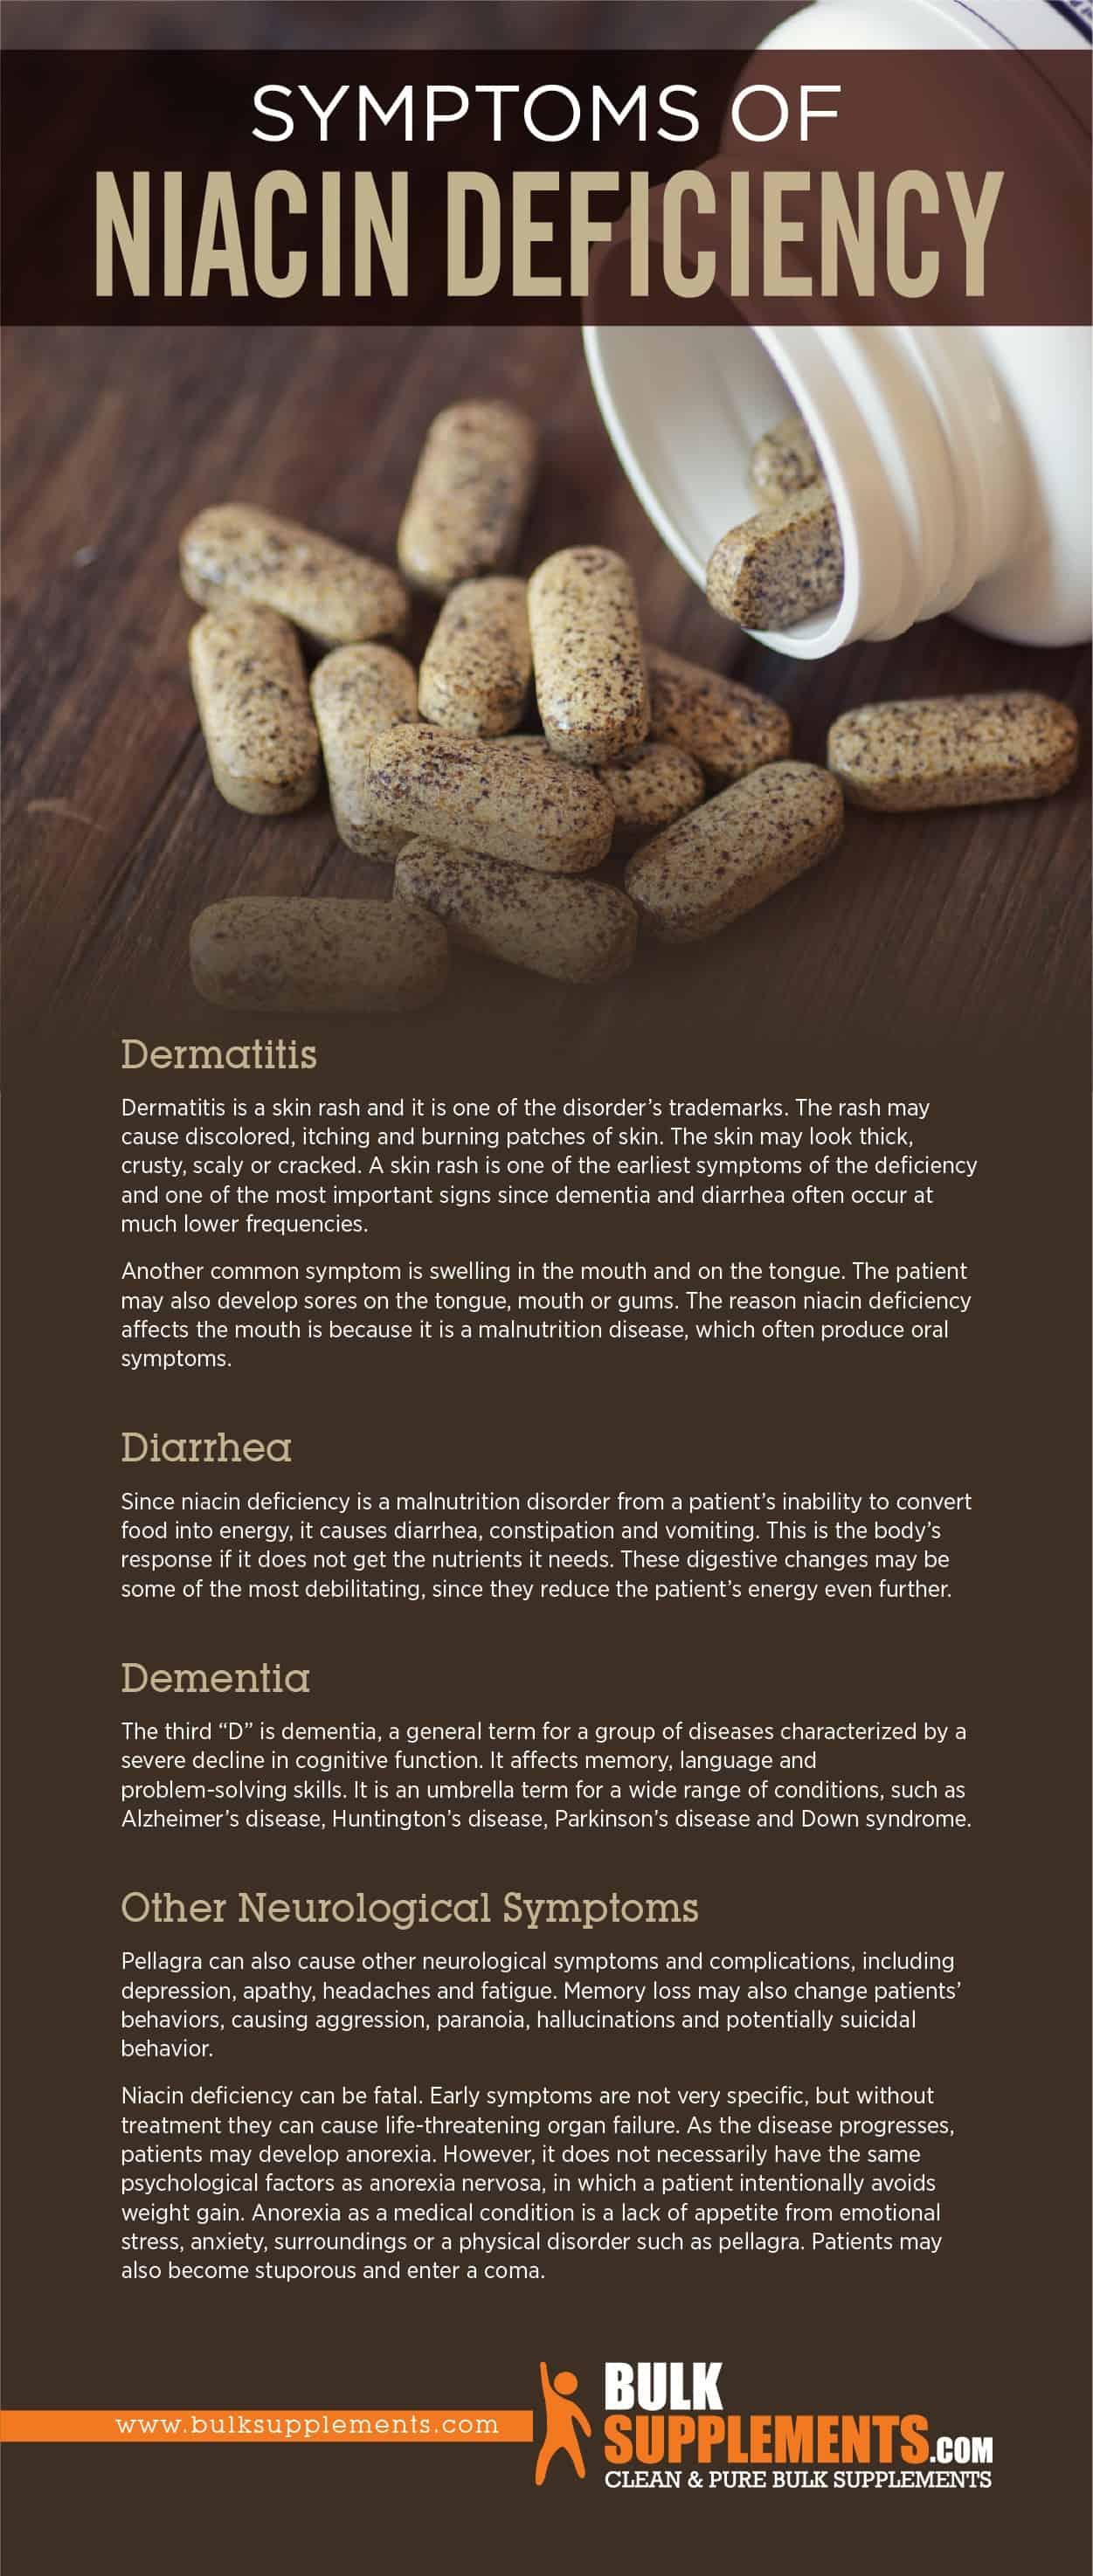 Symptoms of Niacin Deficiency